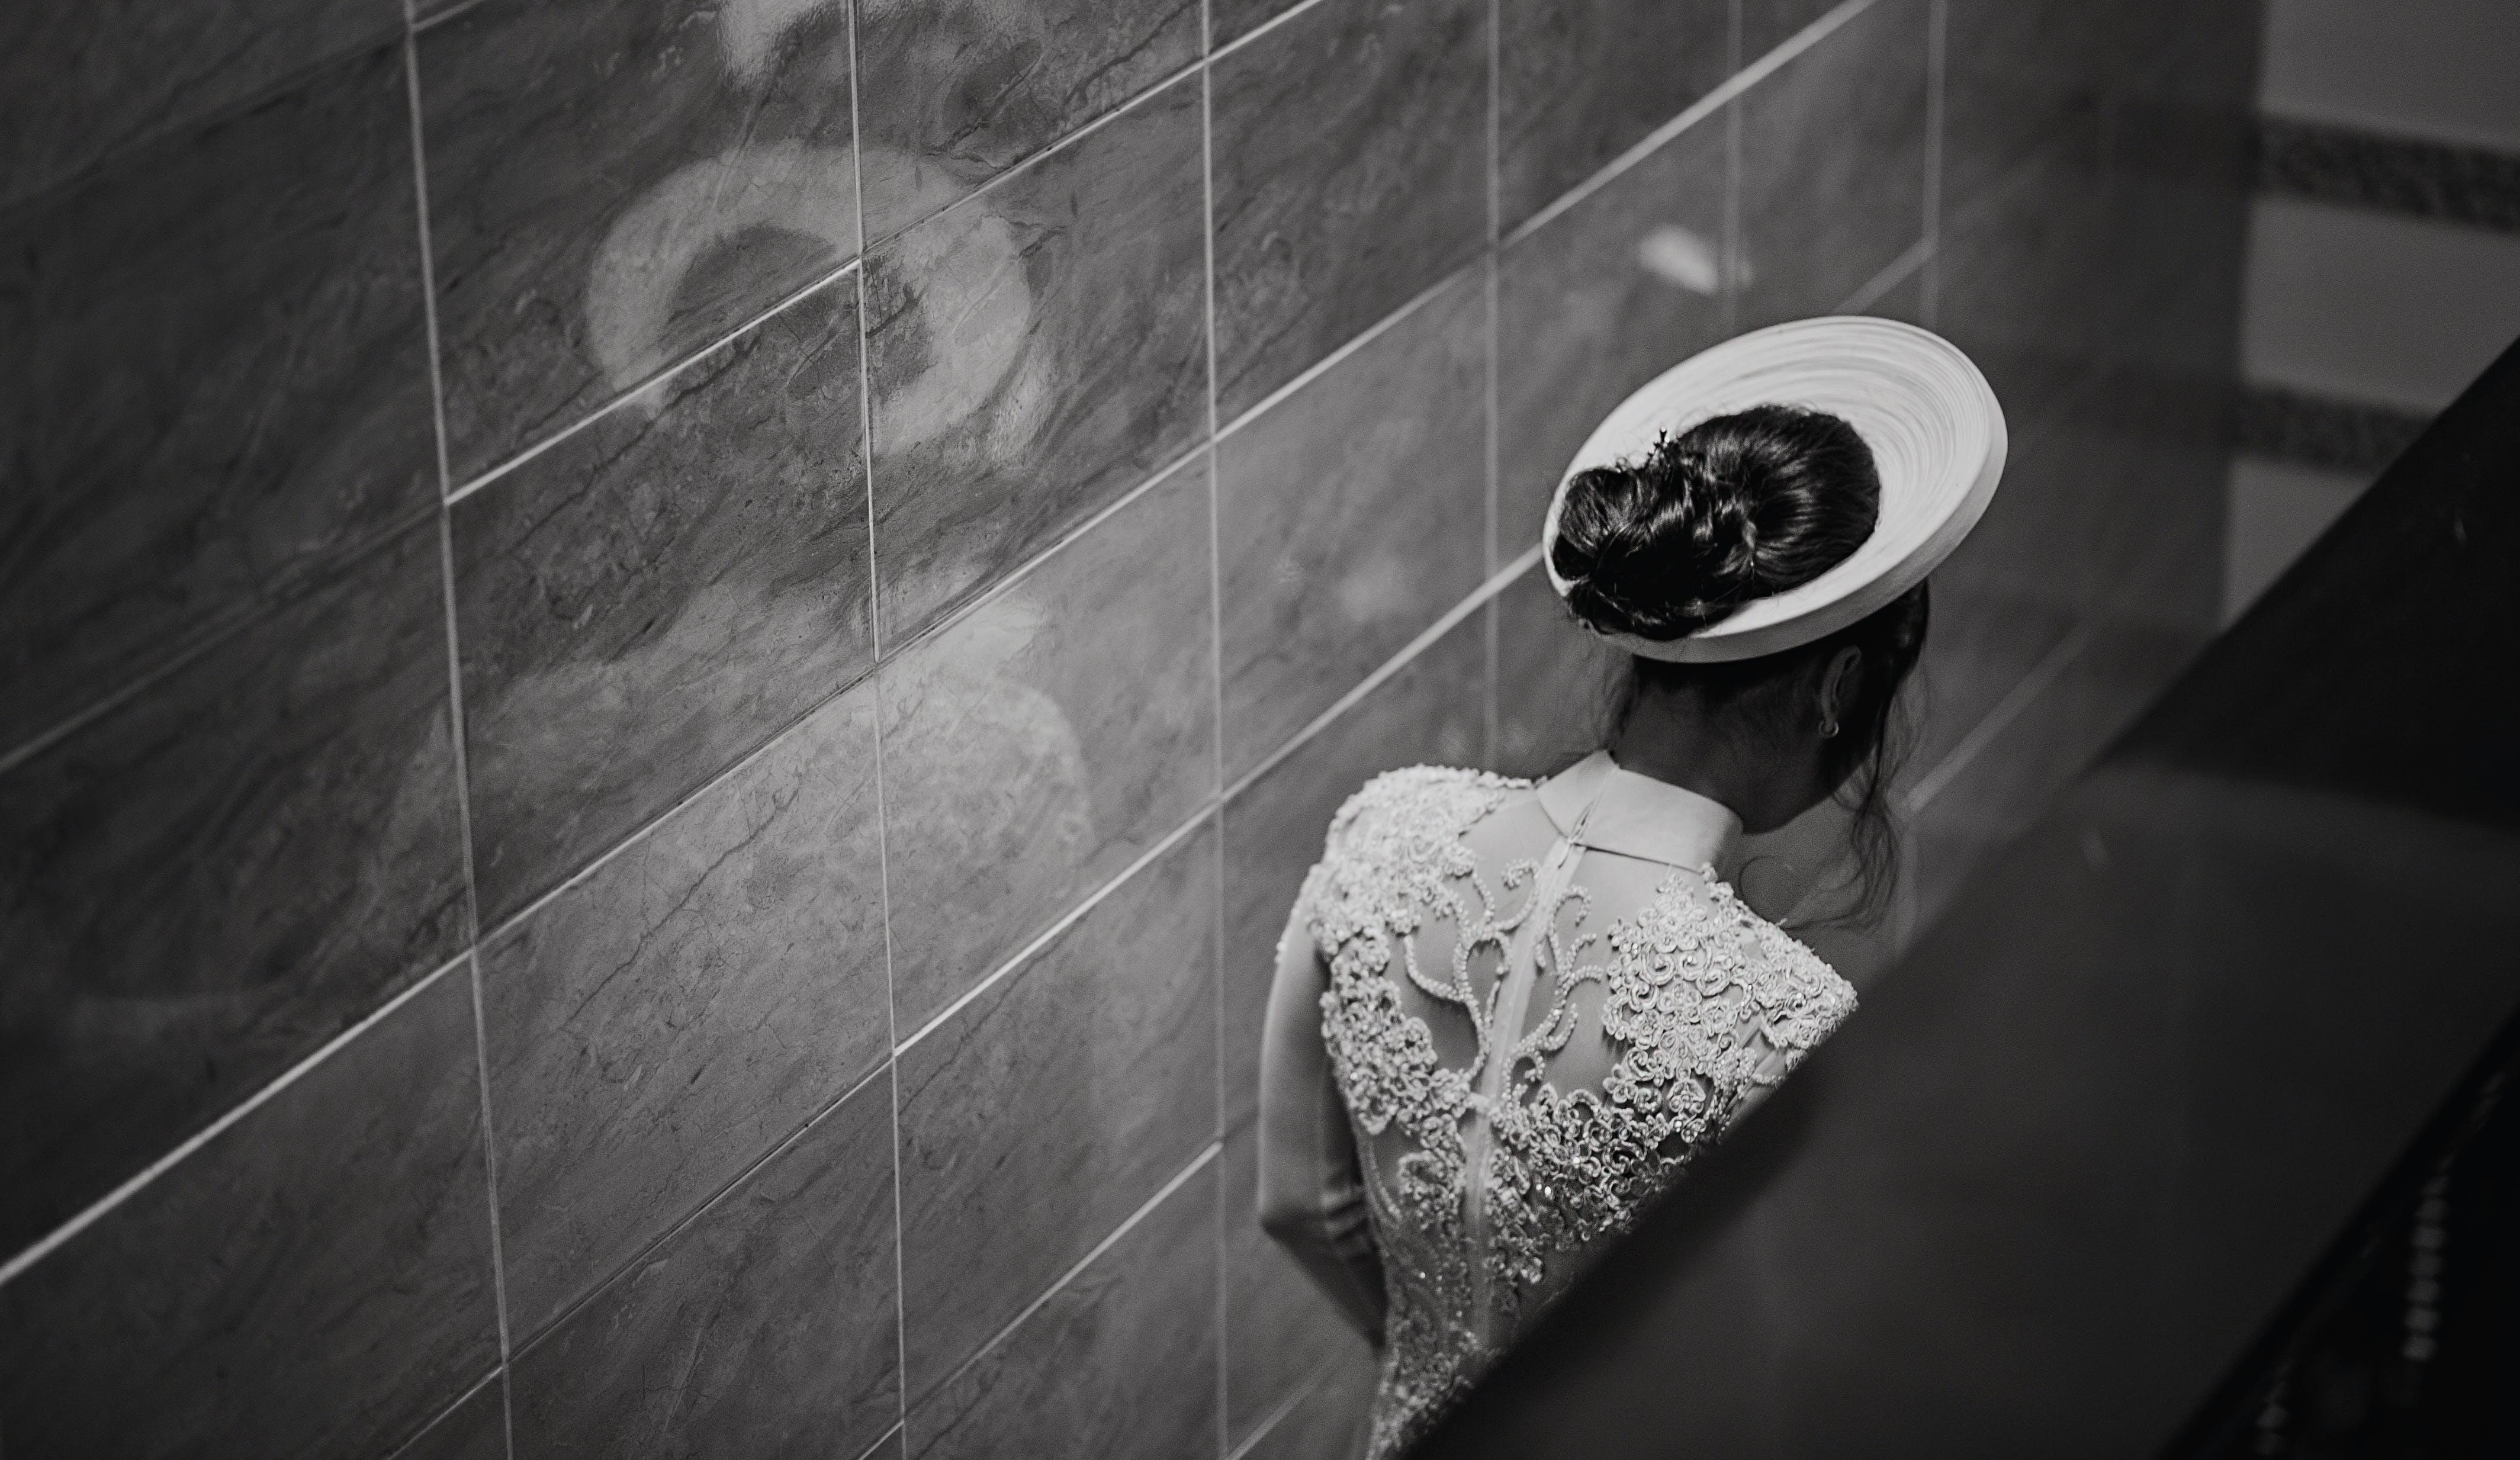 Woman in White Dress Standing Inside Room